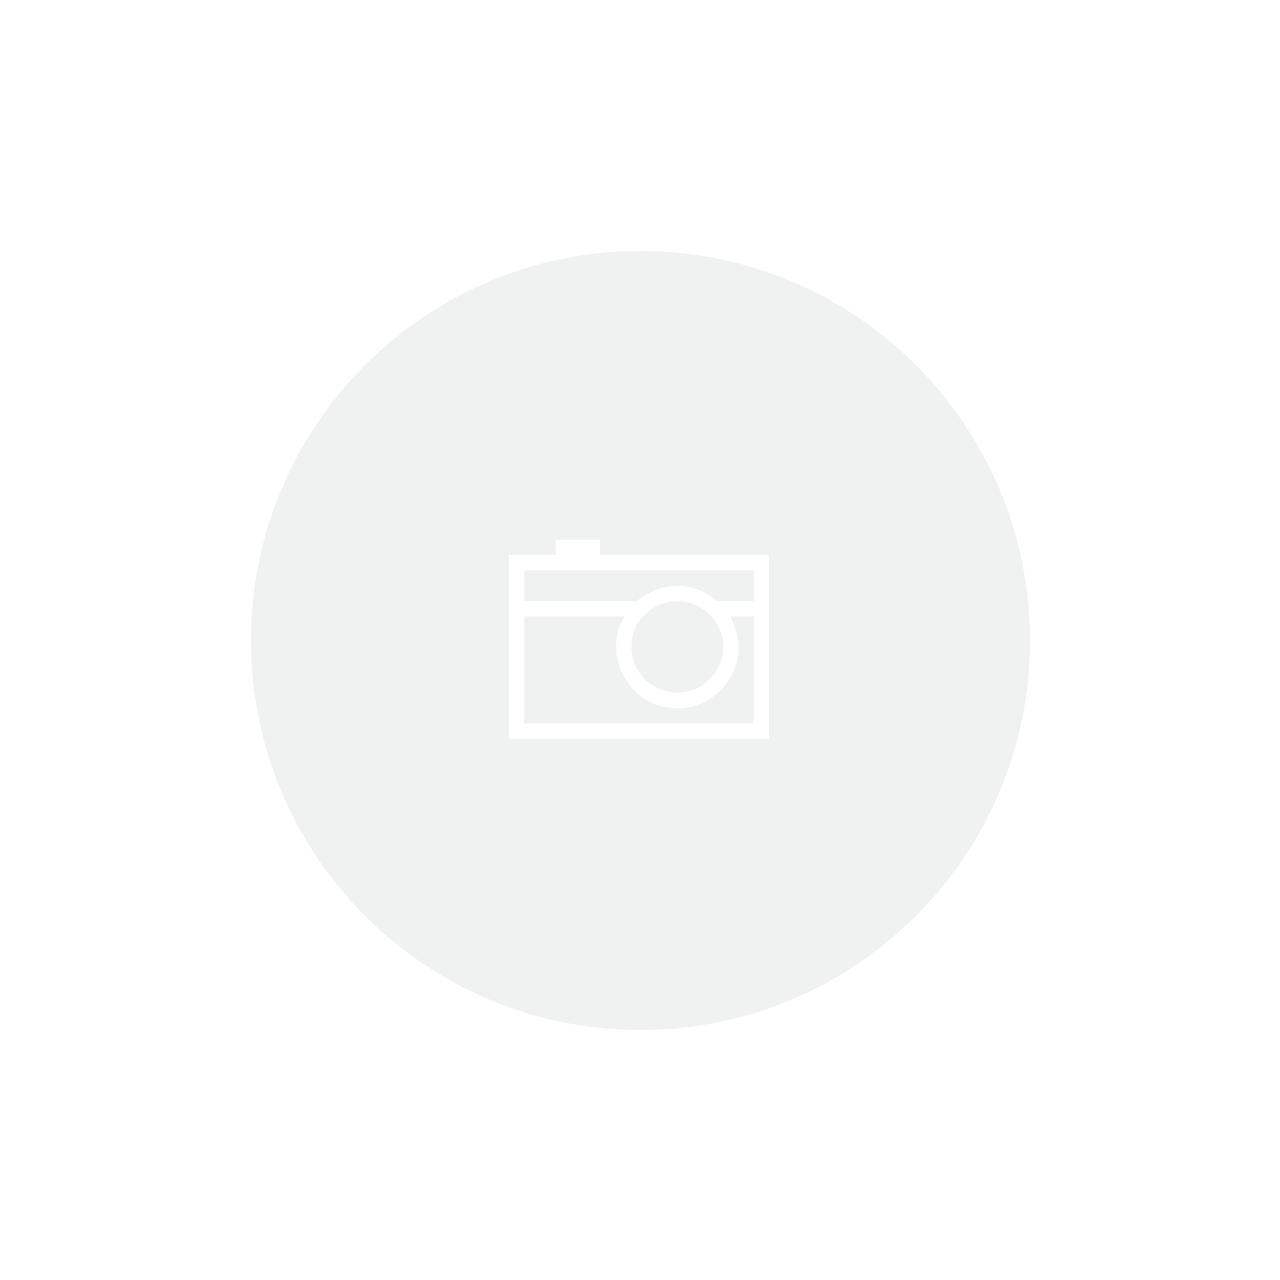 Caçarola Funda Inox 20Cm 3,10 Litros Allegra Tramontina